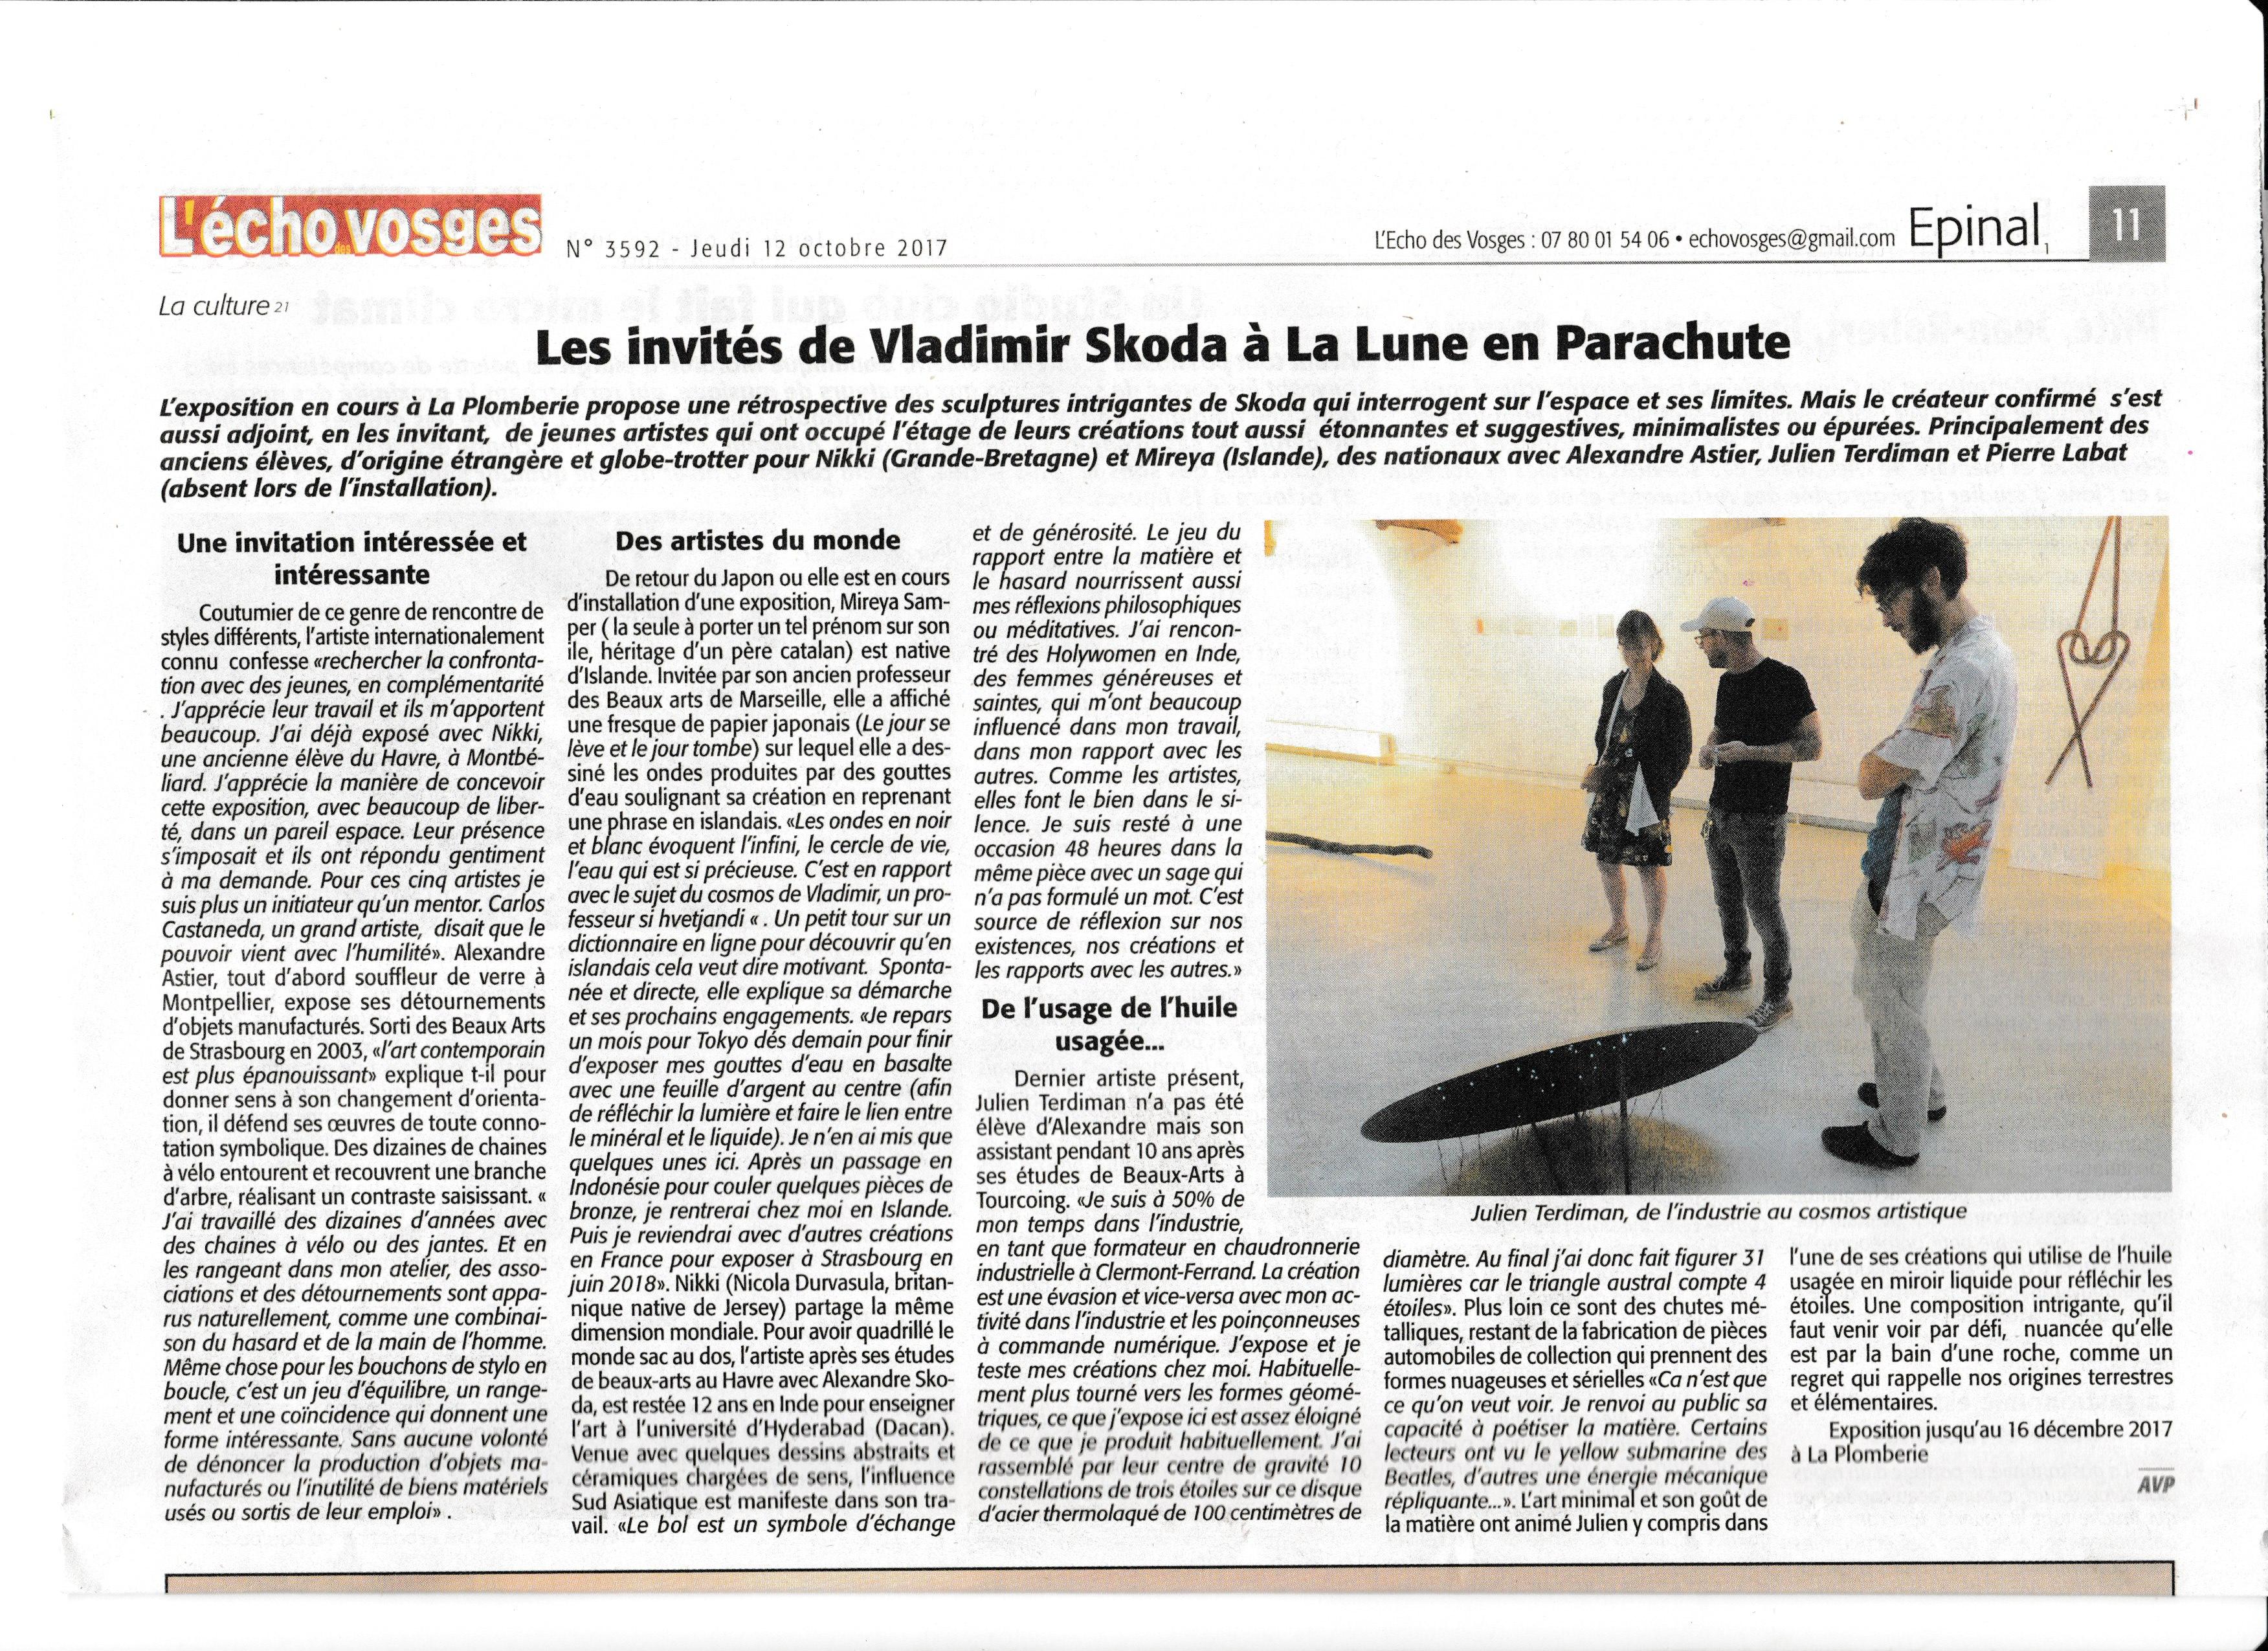 la-lune-en-parachute-galerie-art-contemporain-echo-vosges-vladimir-skoda